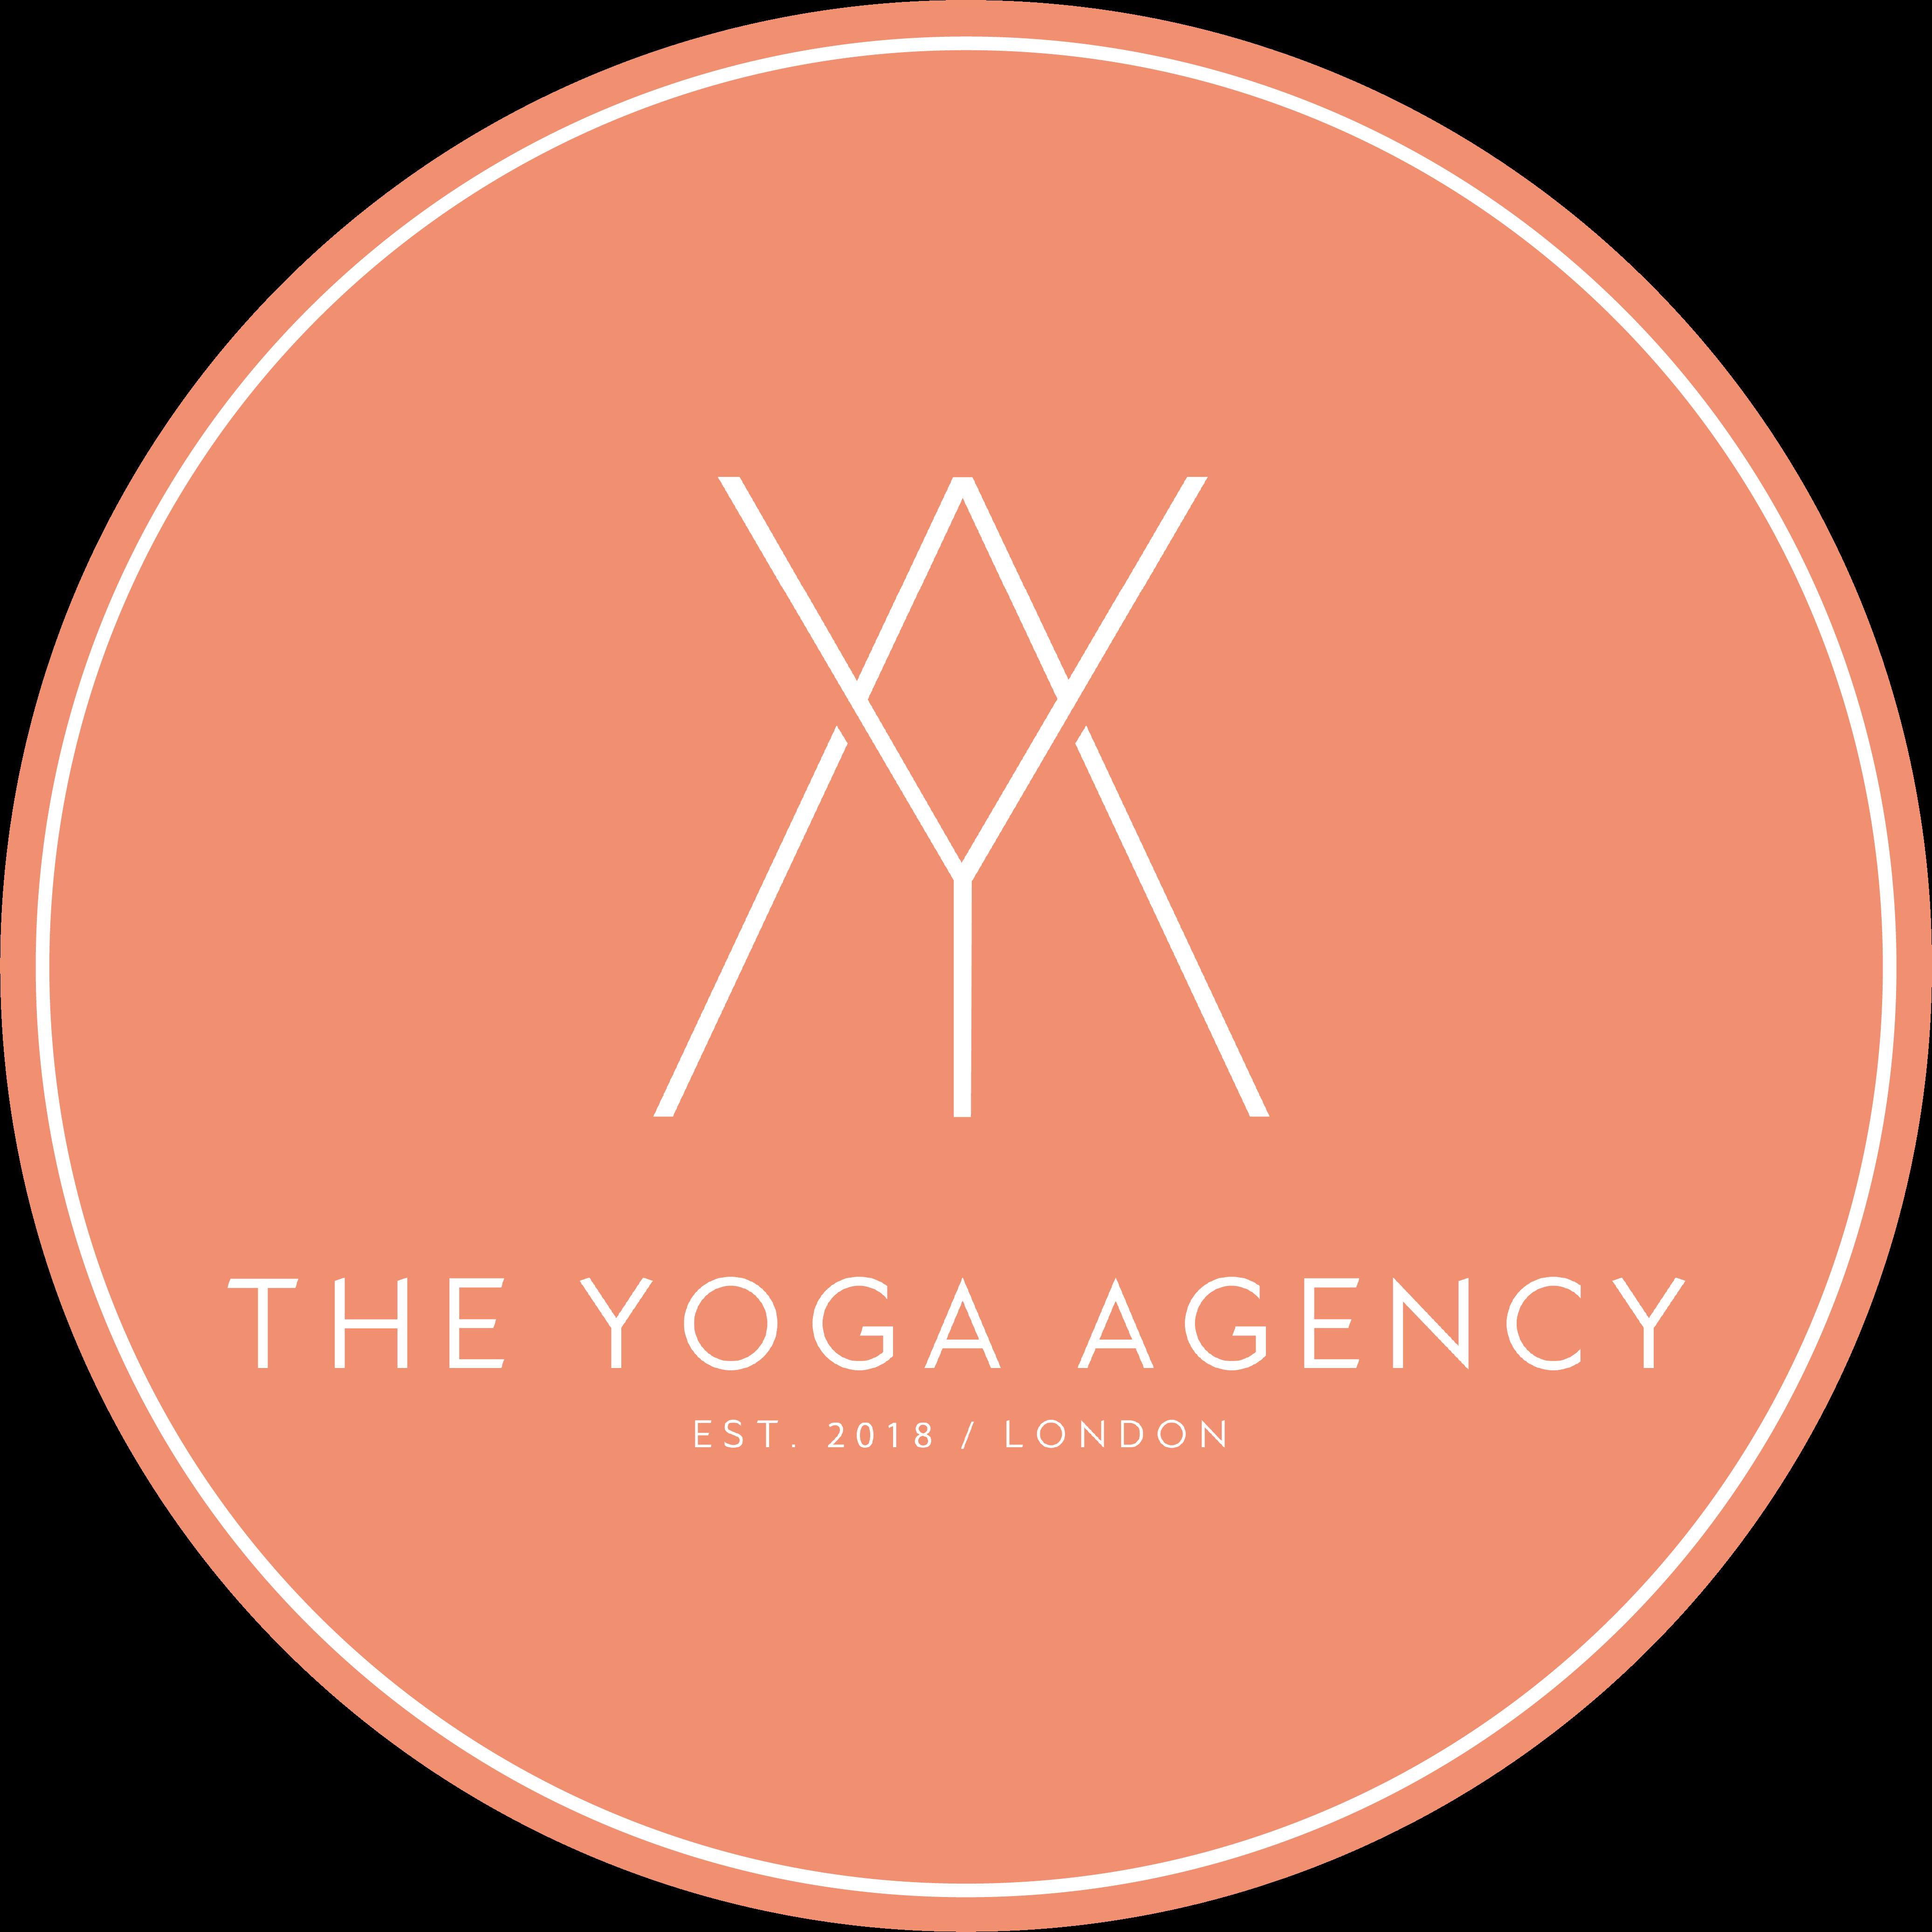 The Yoga Agency